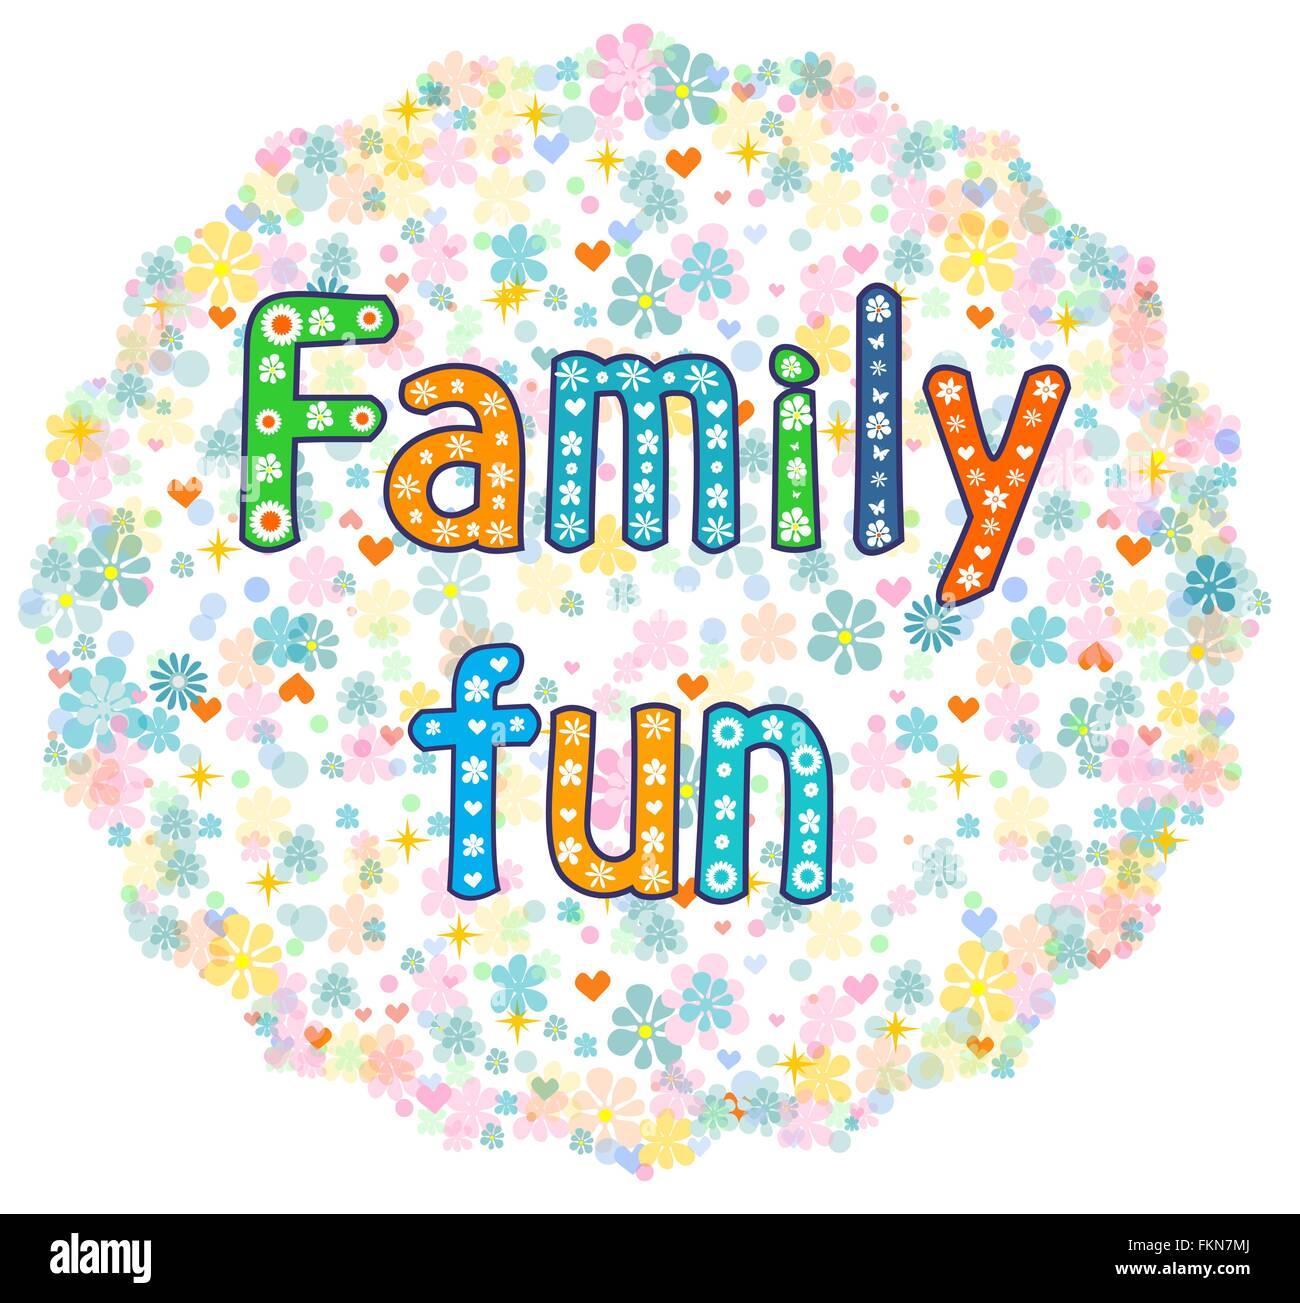 Family fun decorative lettering text. - Stock Vector